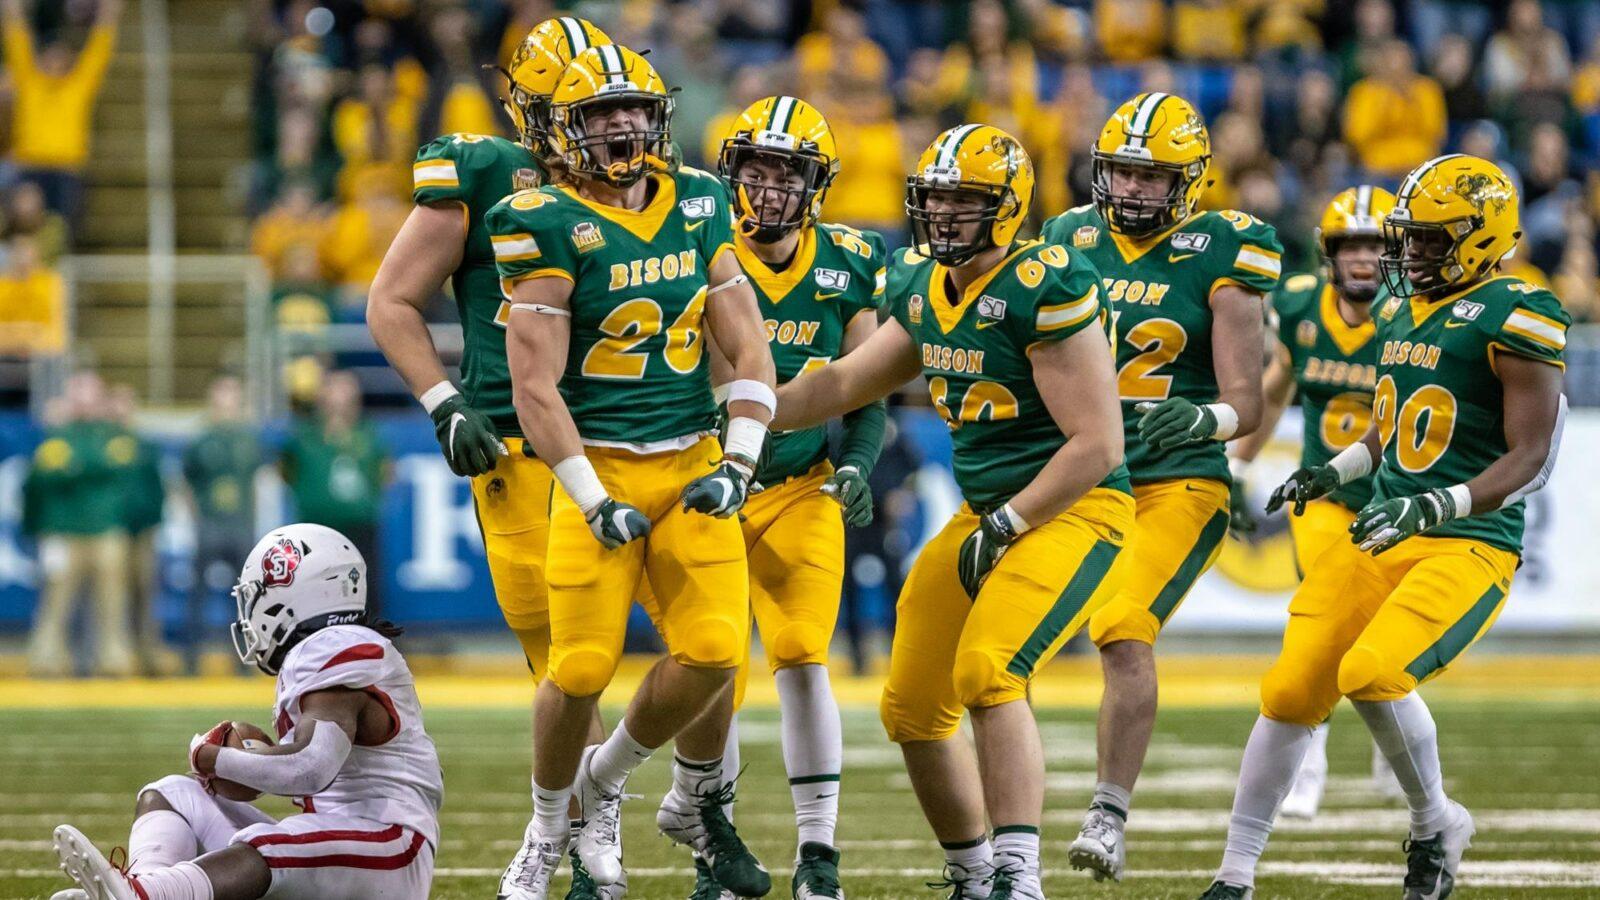 Ndsu Academic Calendar 2022.Reexamining The North Dakota State To Fbs Argument Sports Enthusiasts